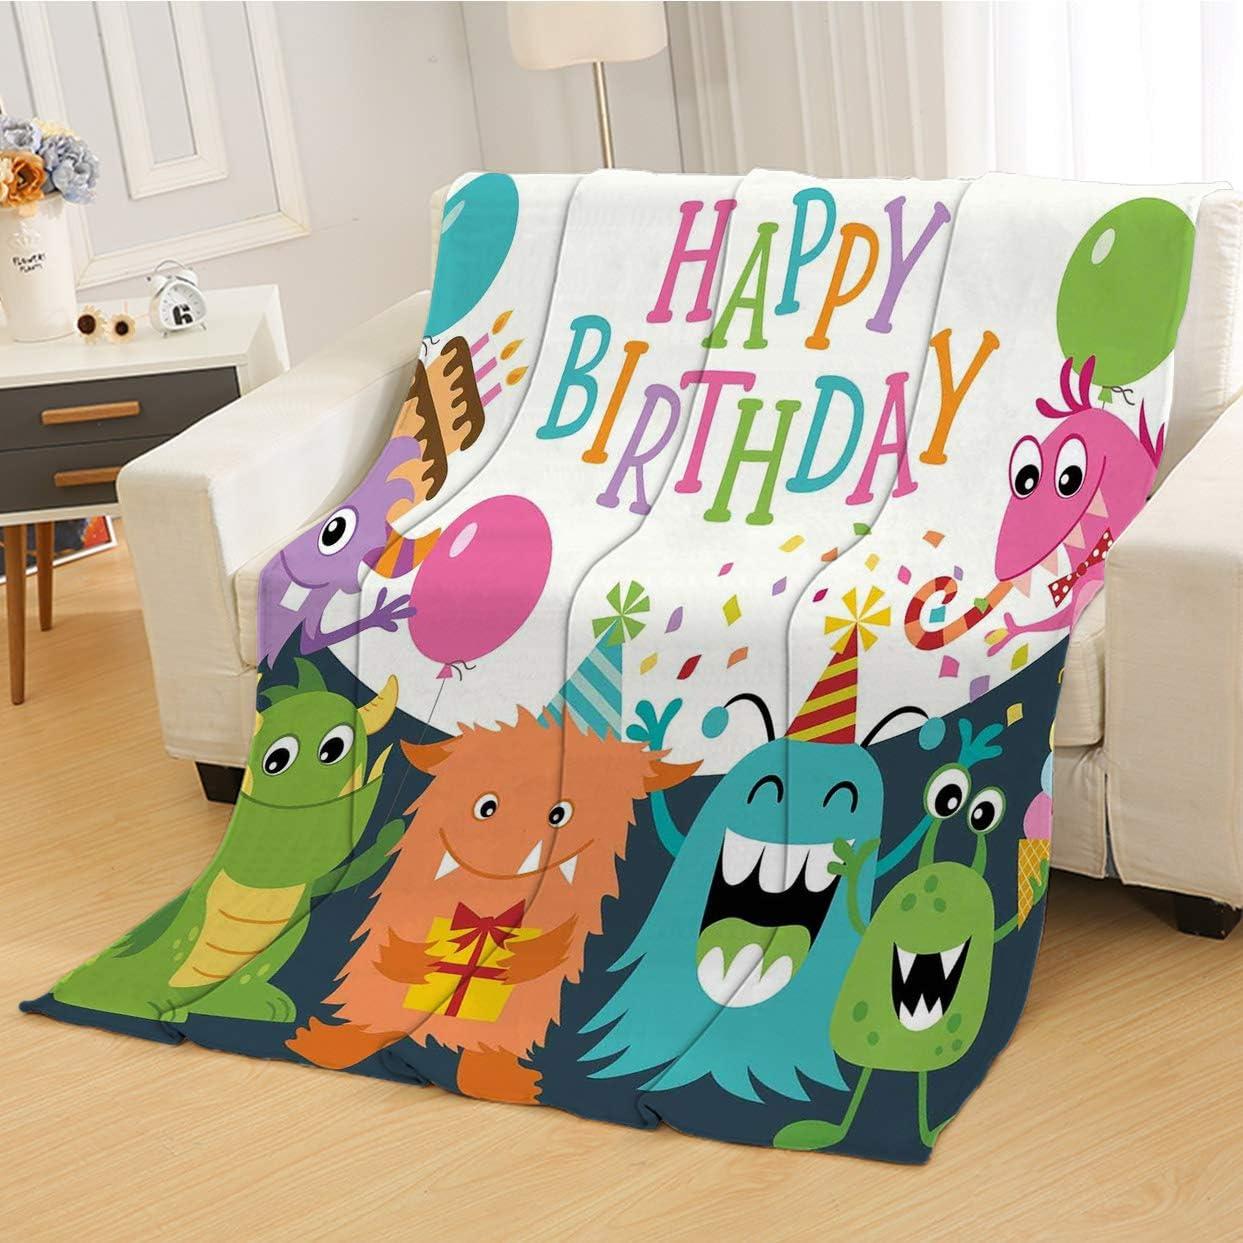 RLDSESS Birthday Warm King Bed Blanket All Season OFFicial Kids Omaha Mall